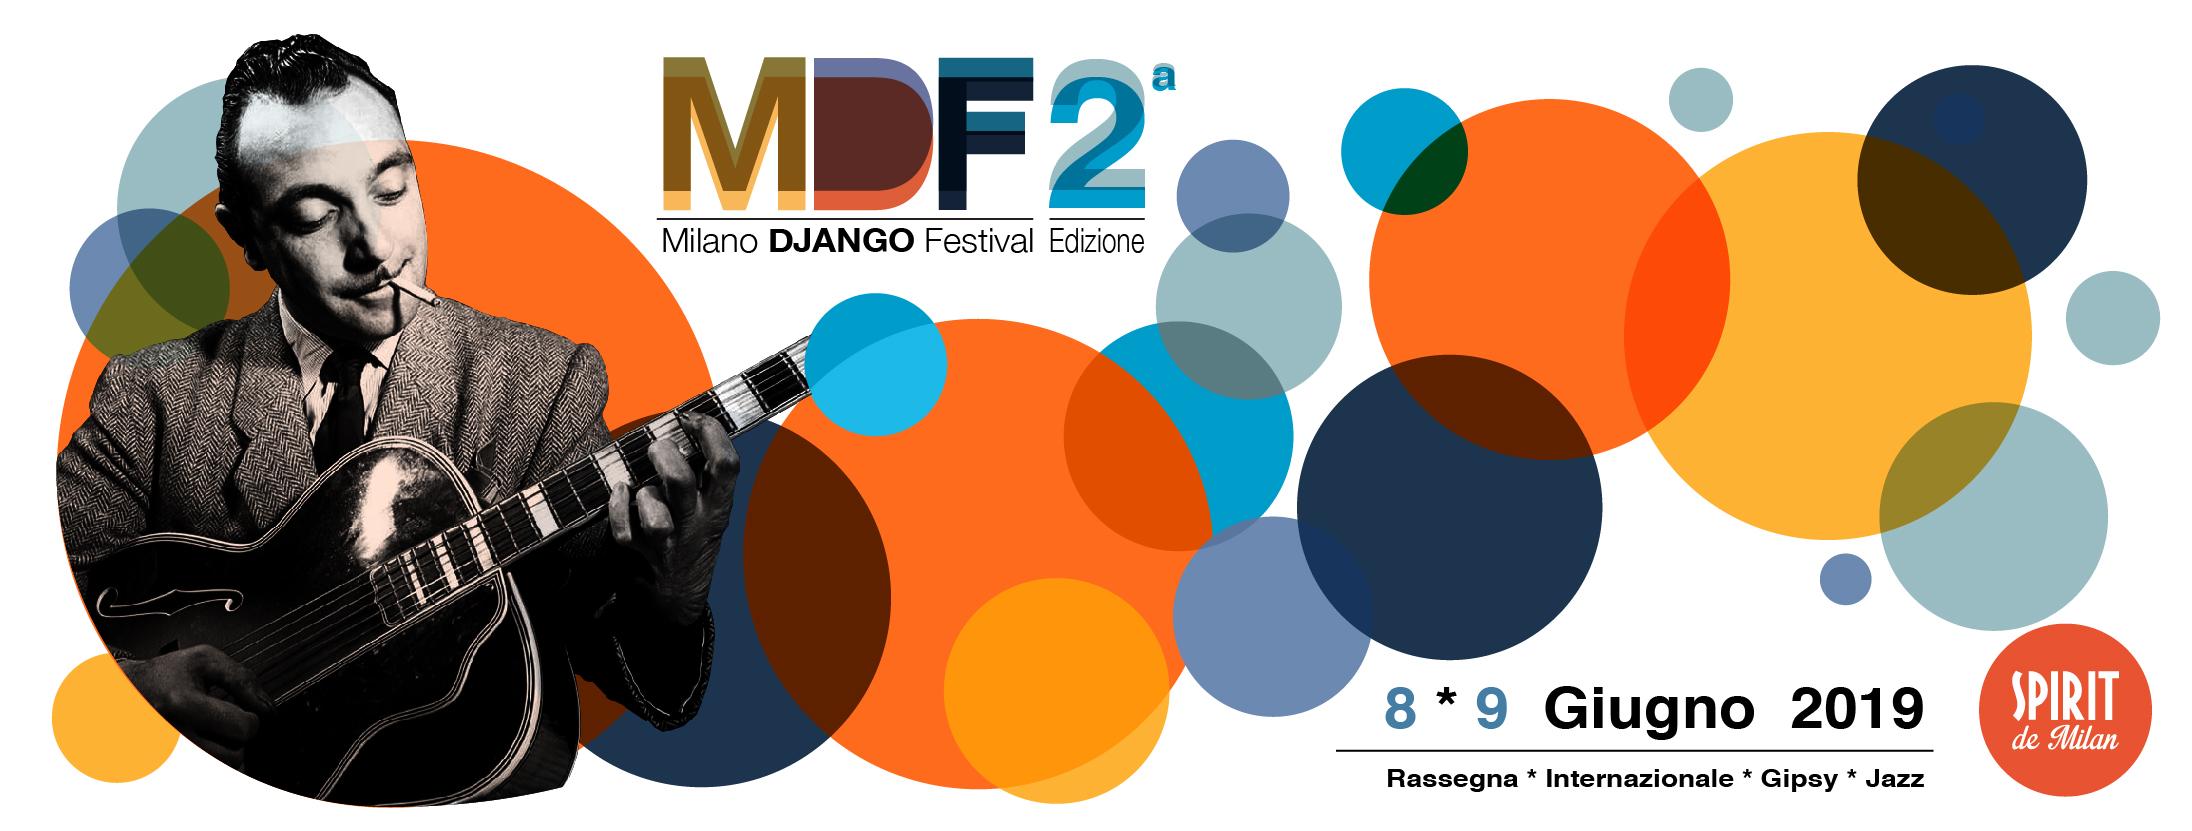 Milano Django Festival 2019